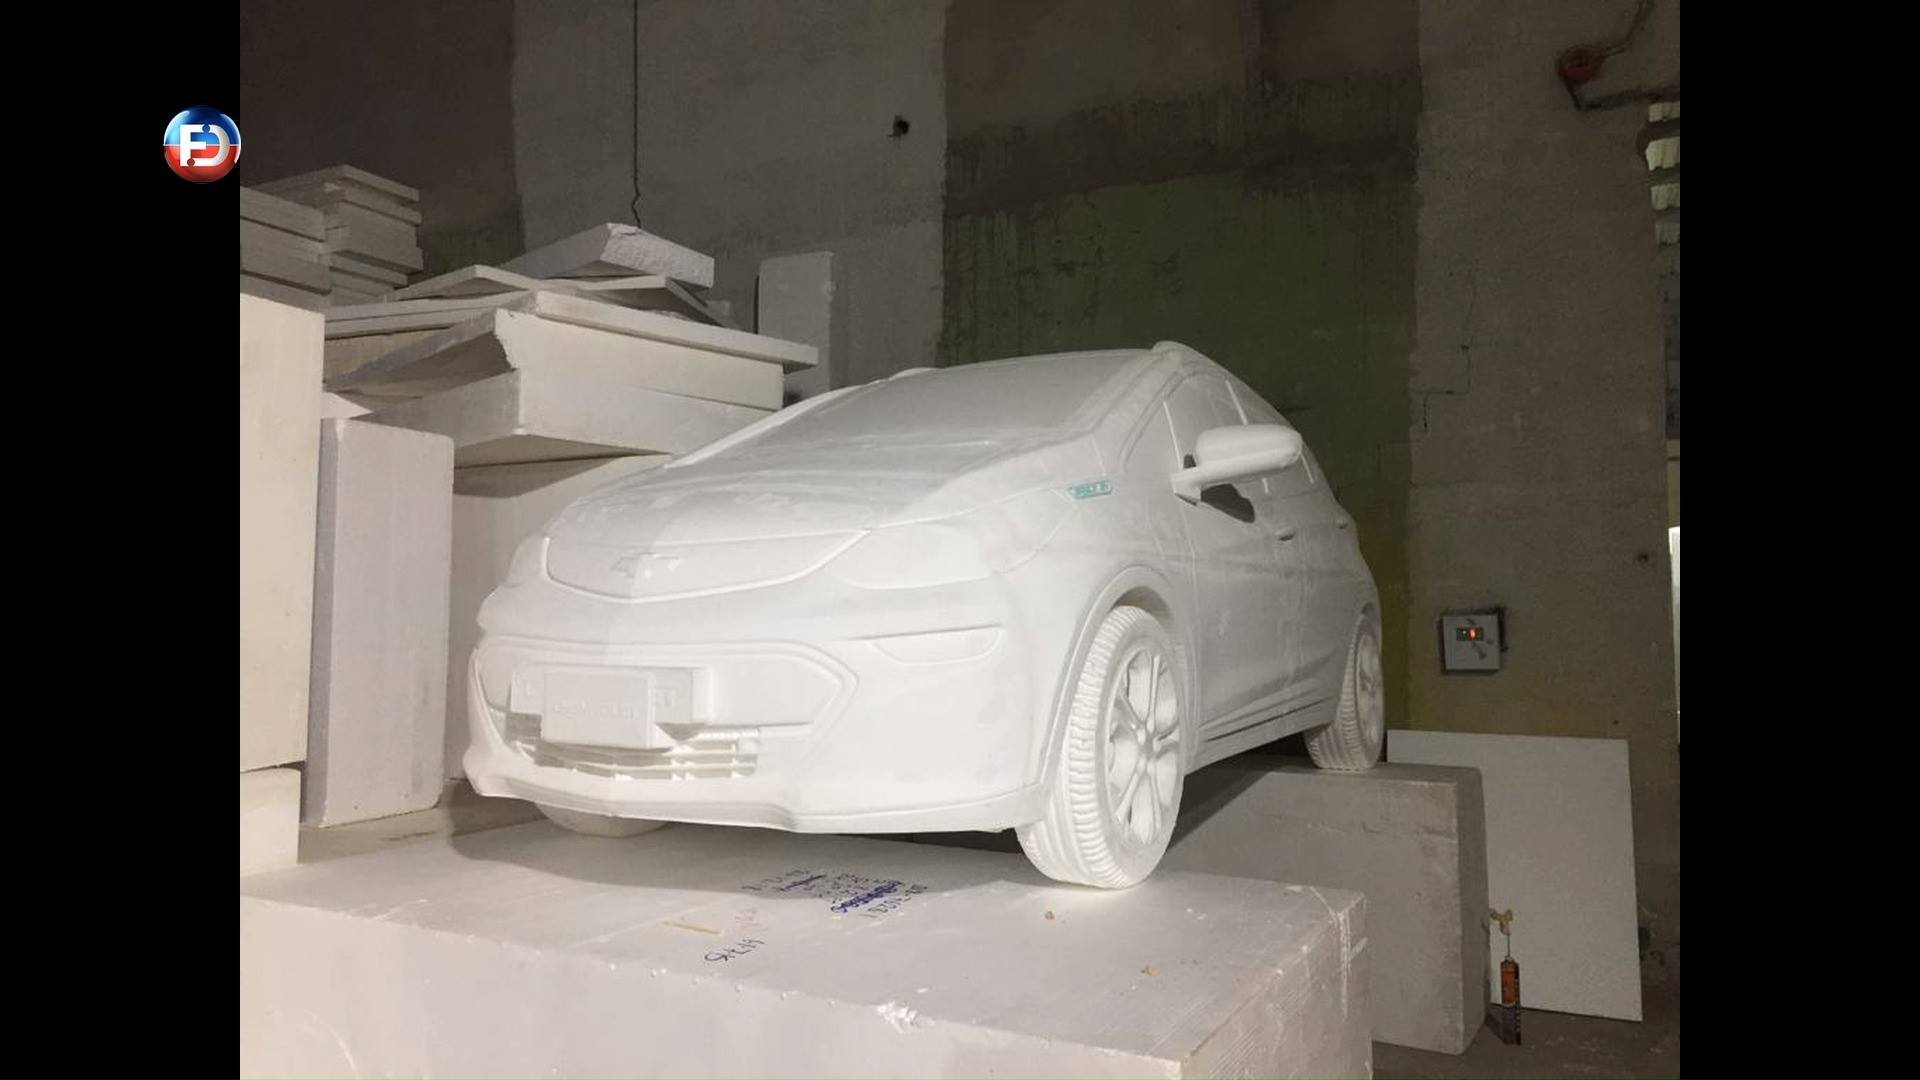 3D CAR MODEL - BOLT 2019 - Outdoor advertising